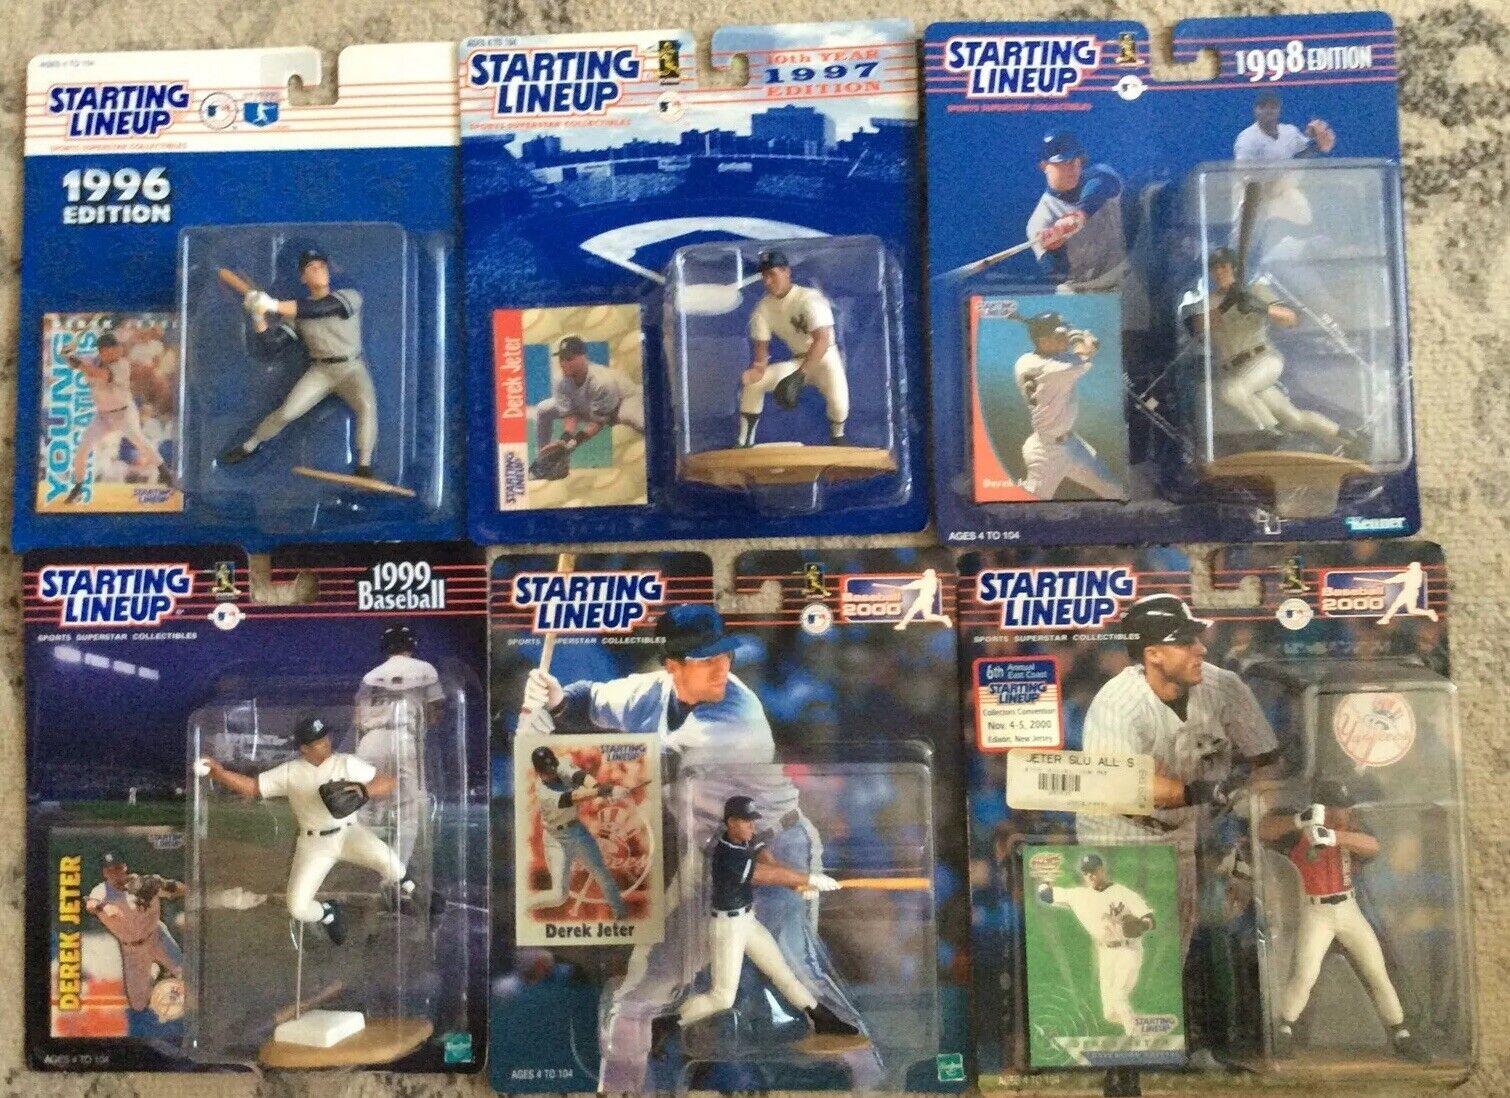 Estrellating Line-Up Derek Jeter Set Figuras De Acción (6) 1996-2000 Plus Raro 6 thannual